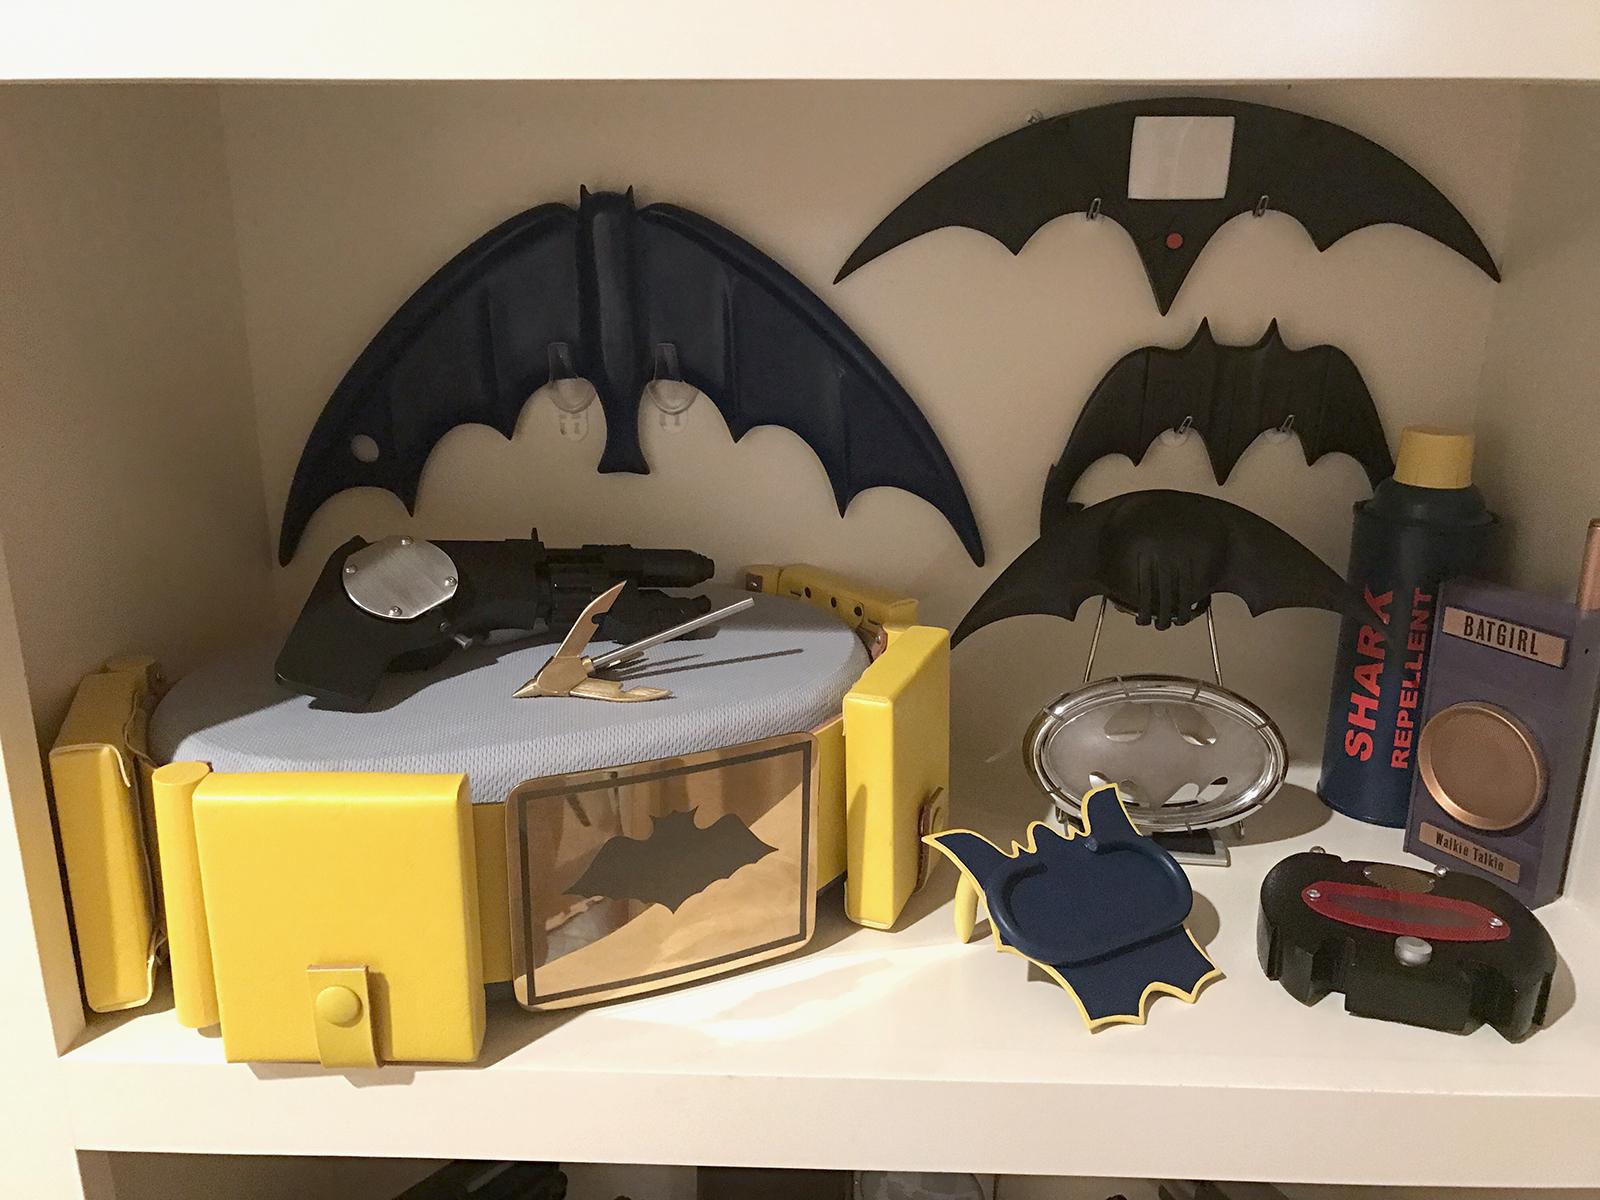 batmancollectionshelf.jpg